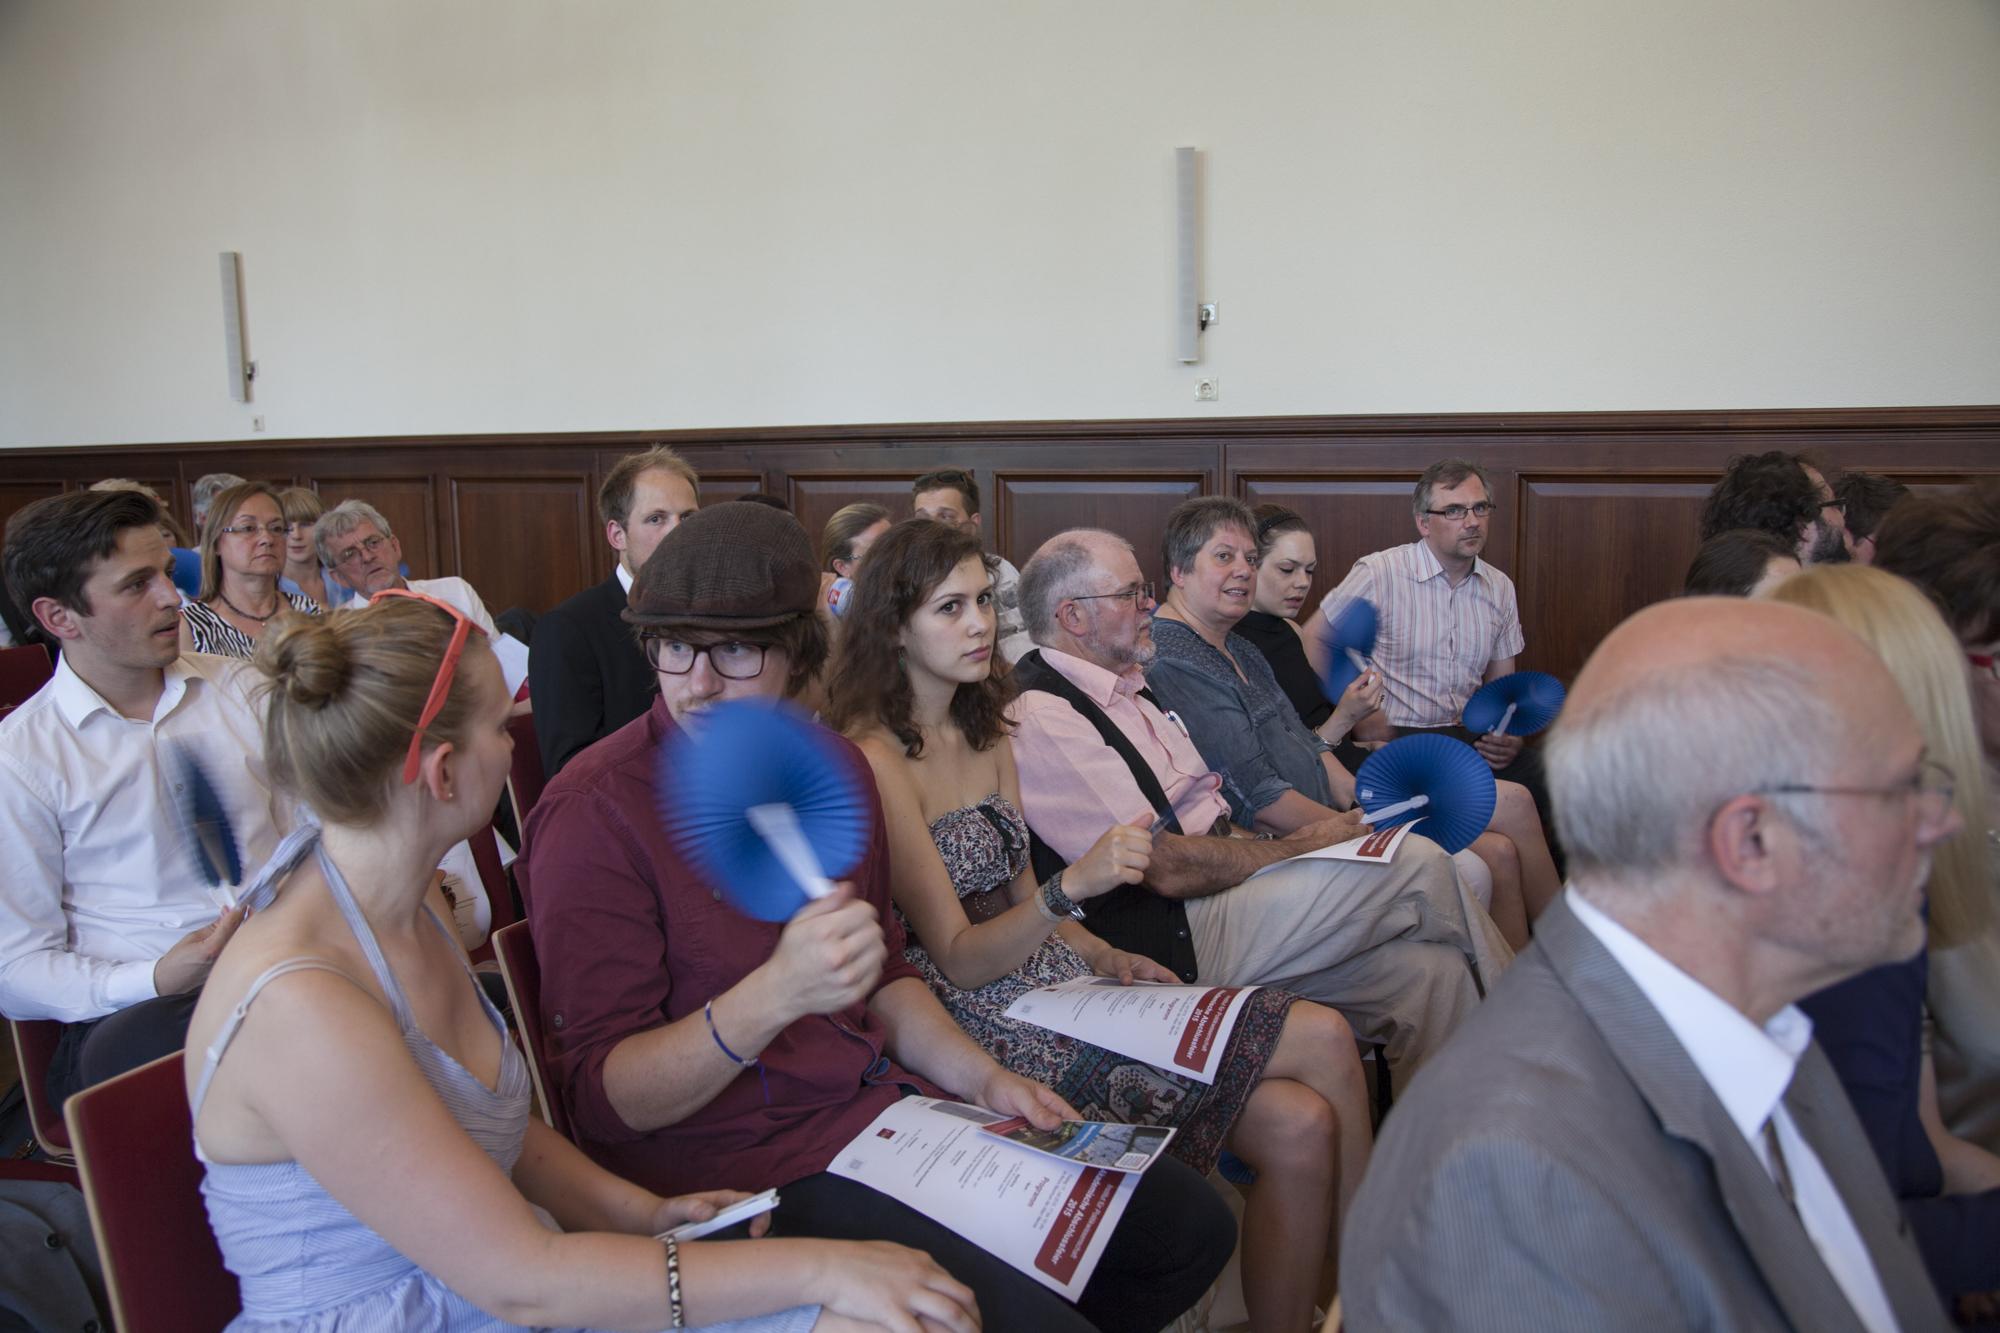 Abschlussfeier Politikwissenschaften (8)